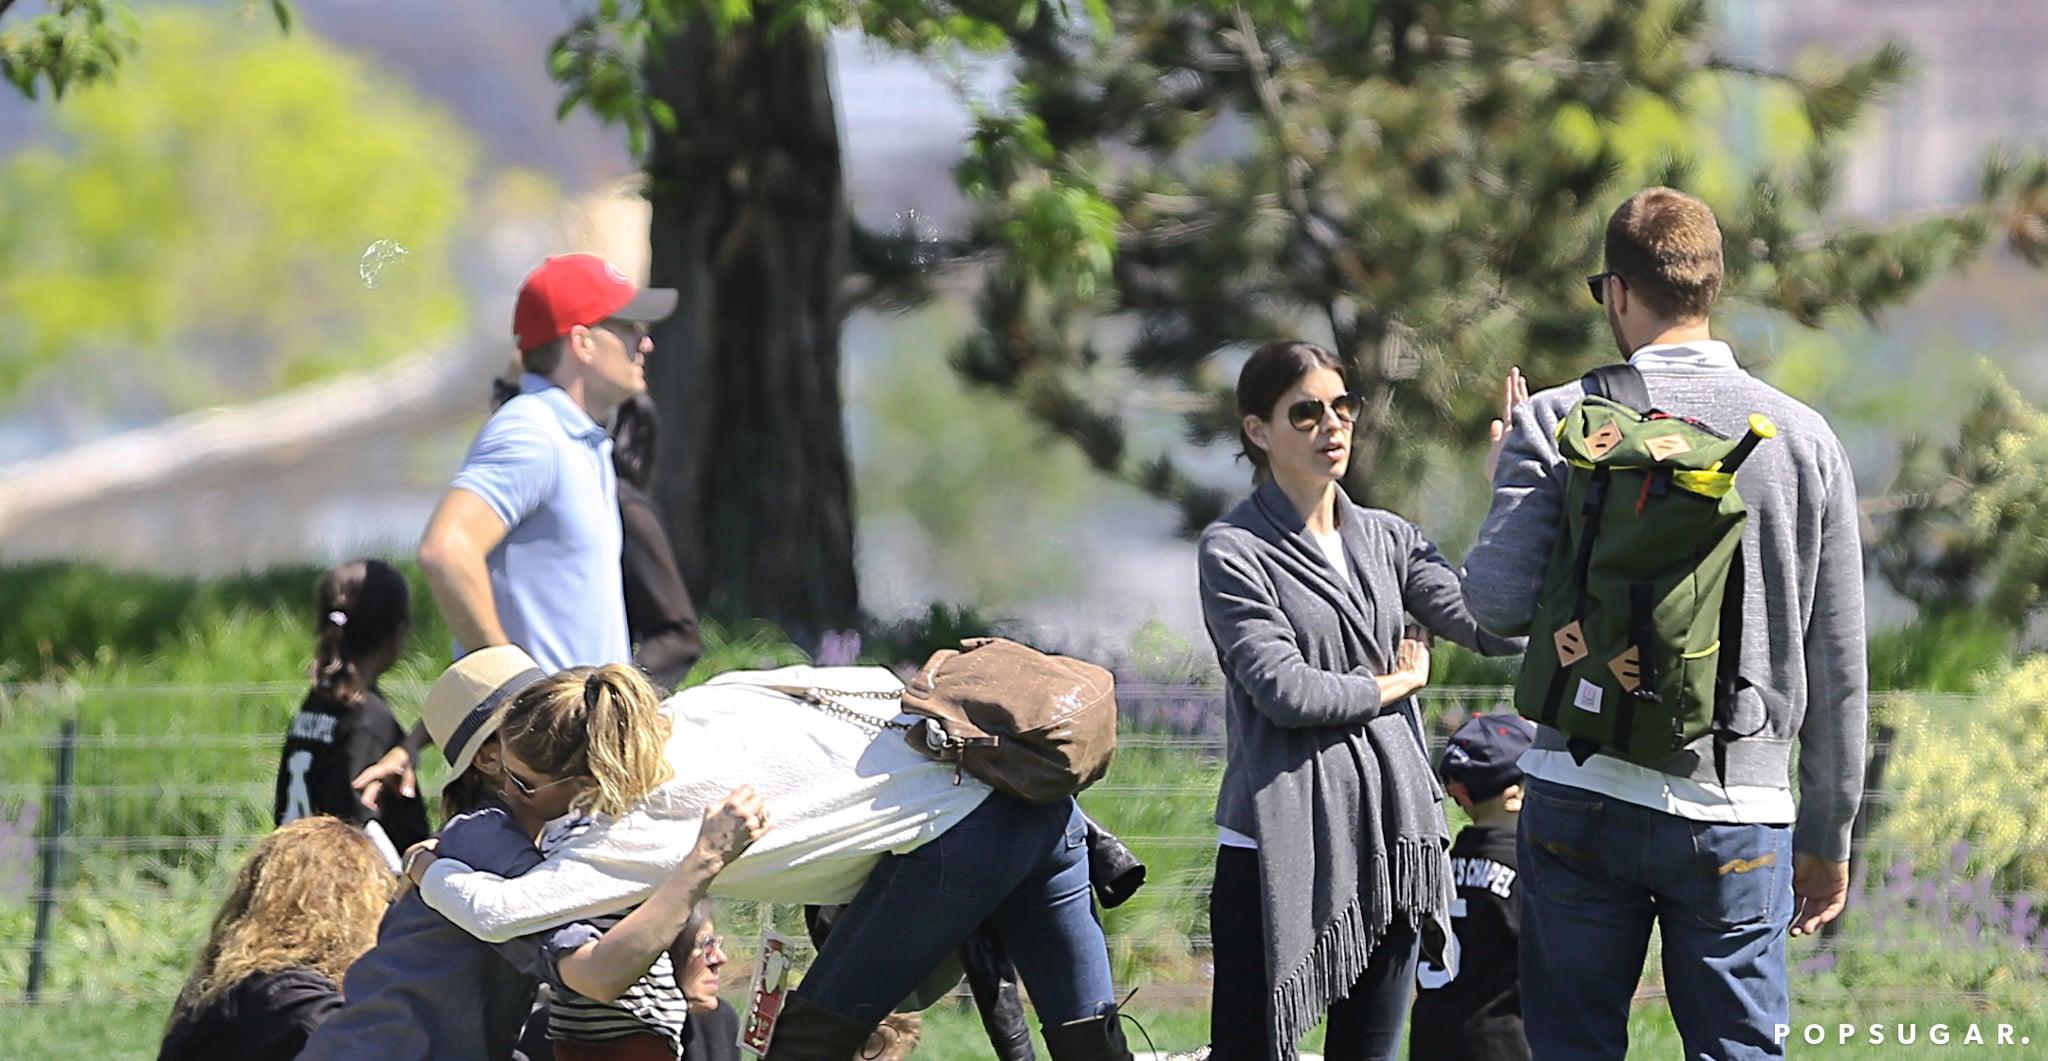 Gisele Bündchen and Tom Brady Get Friendly With Tom's Ex